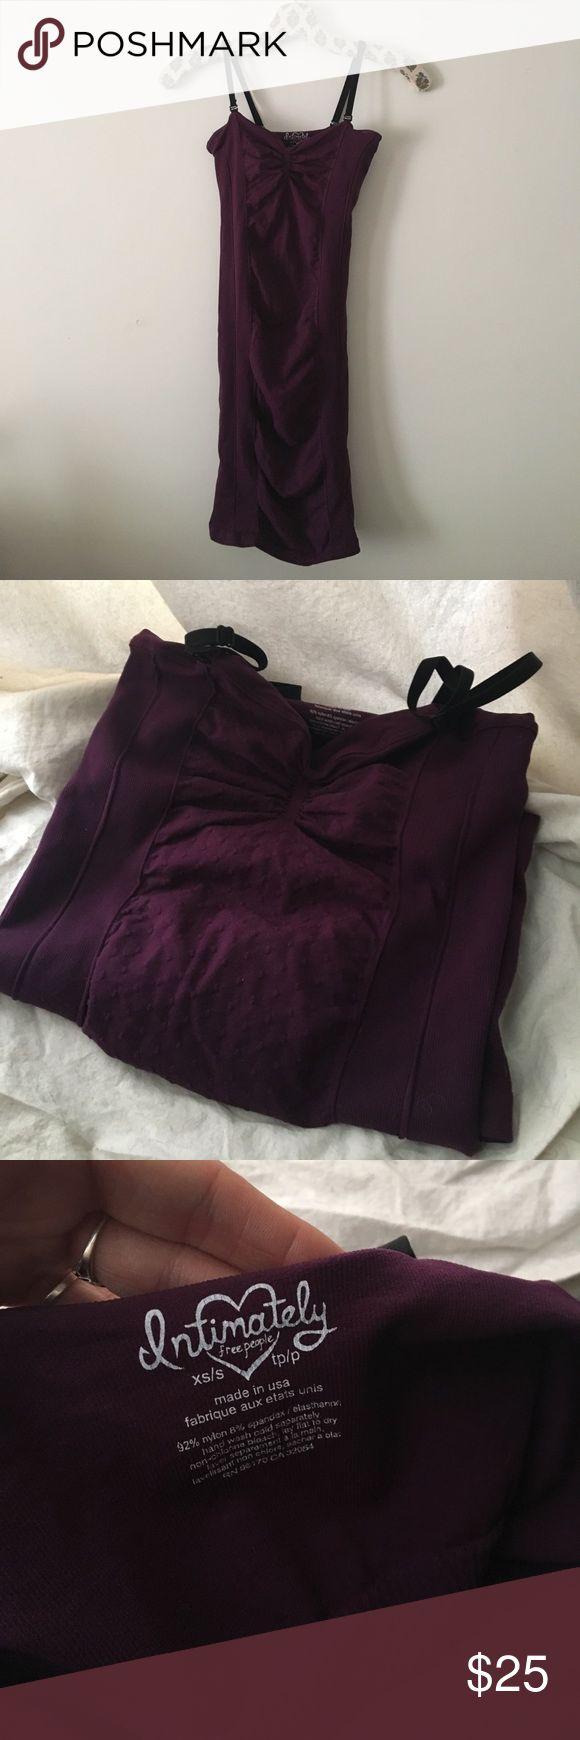 Sexy purple body con slip NWOT Free People purple body con slip. Xs/s, removable straps. Free People Dresses